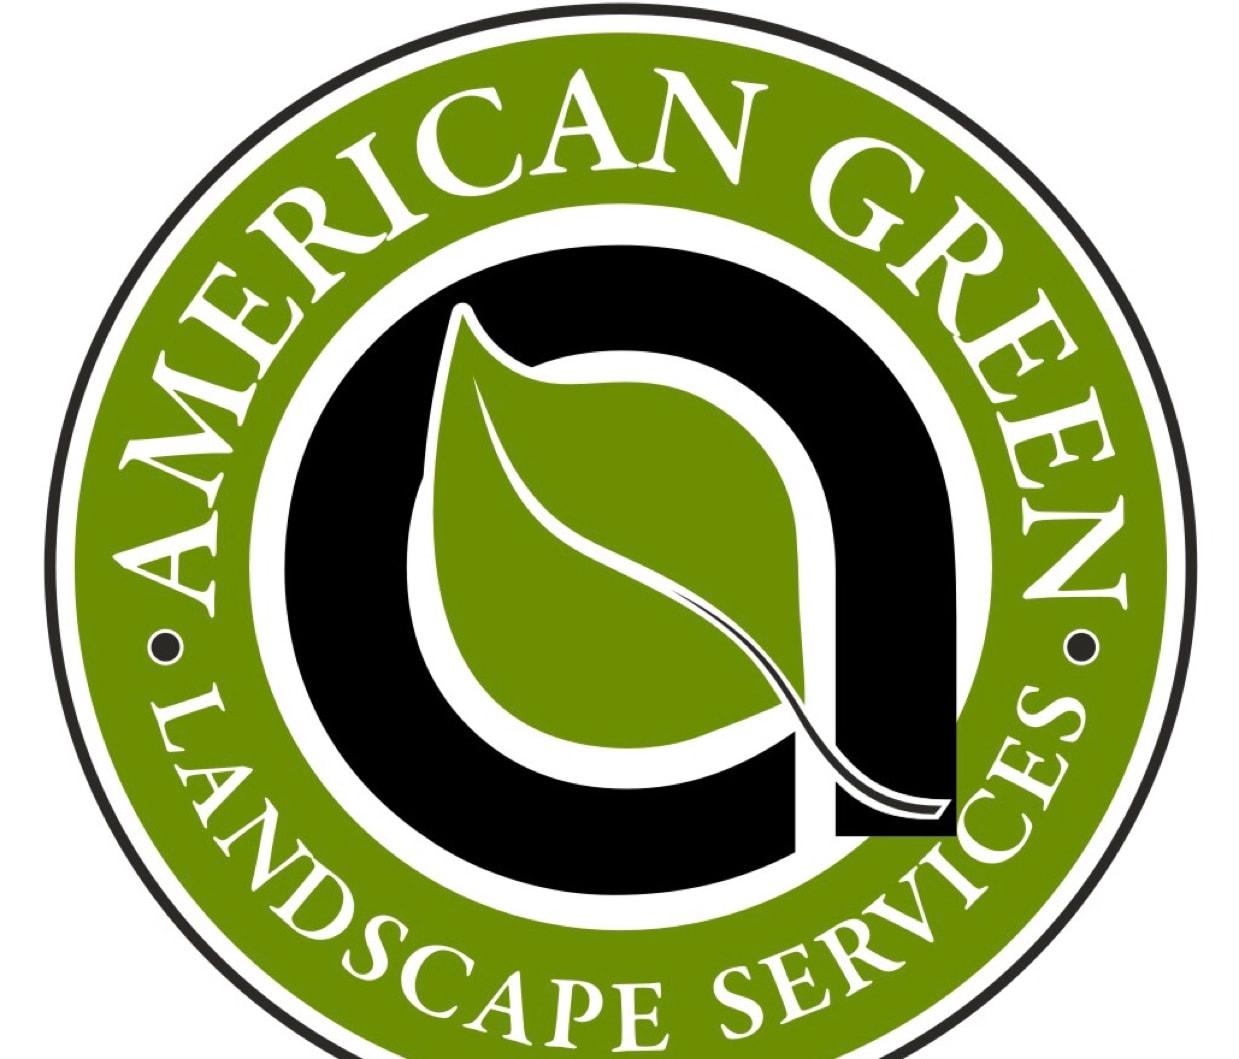 American Green Landscape Services